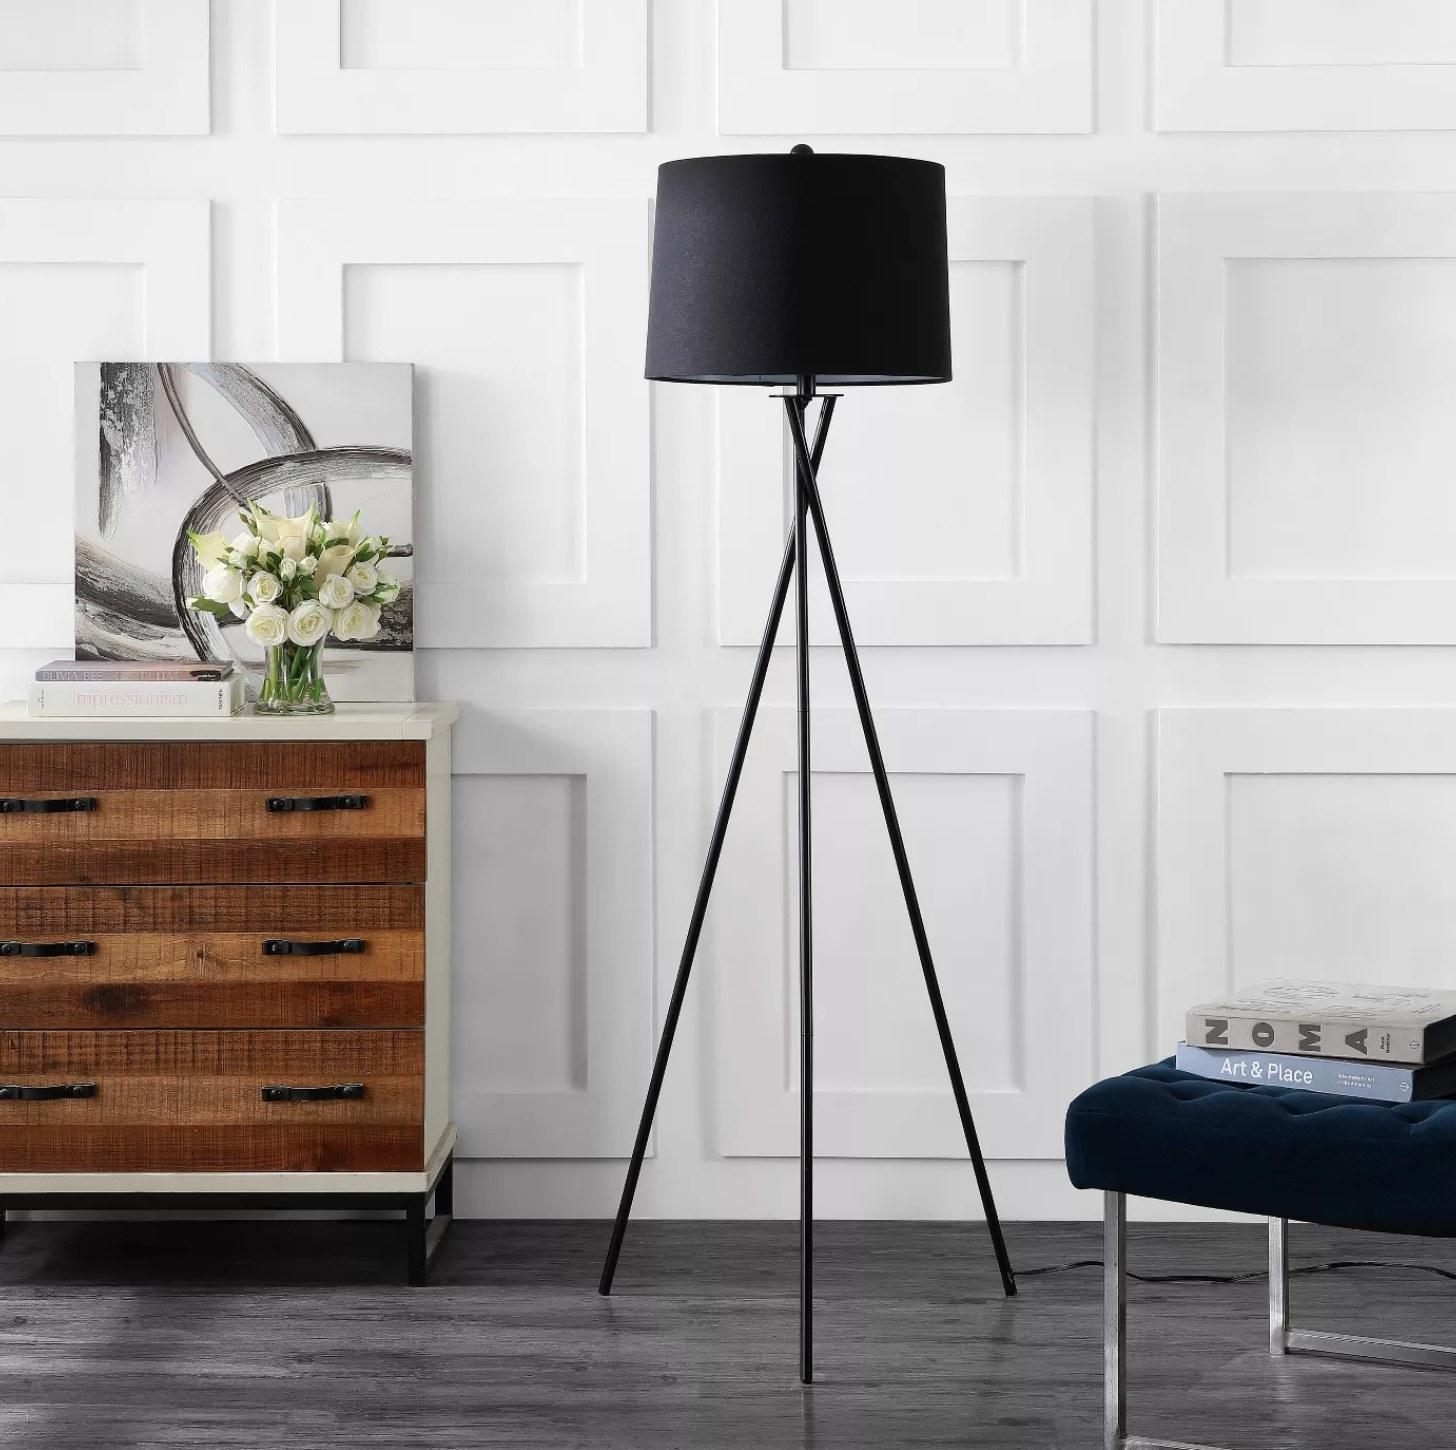 A black floor lamp